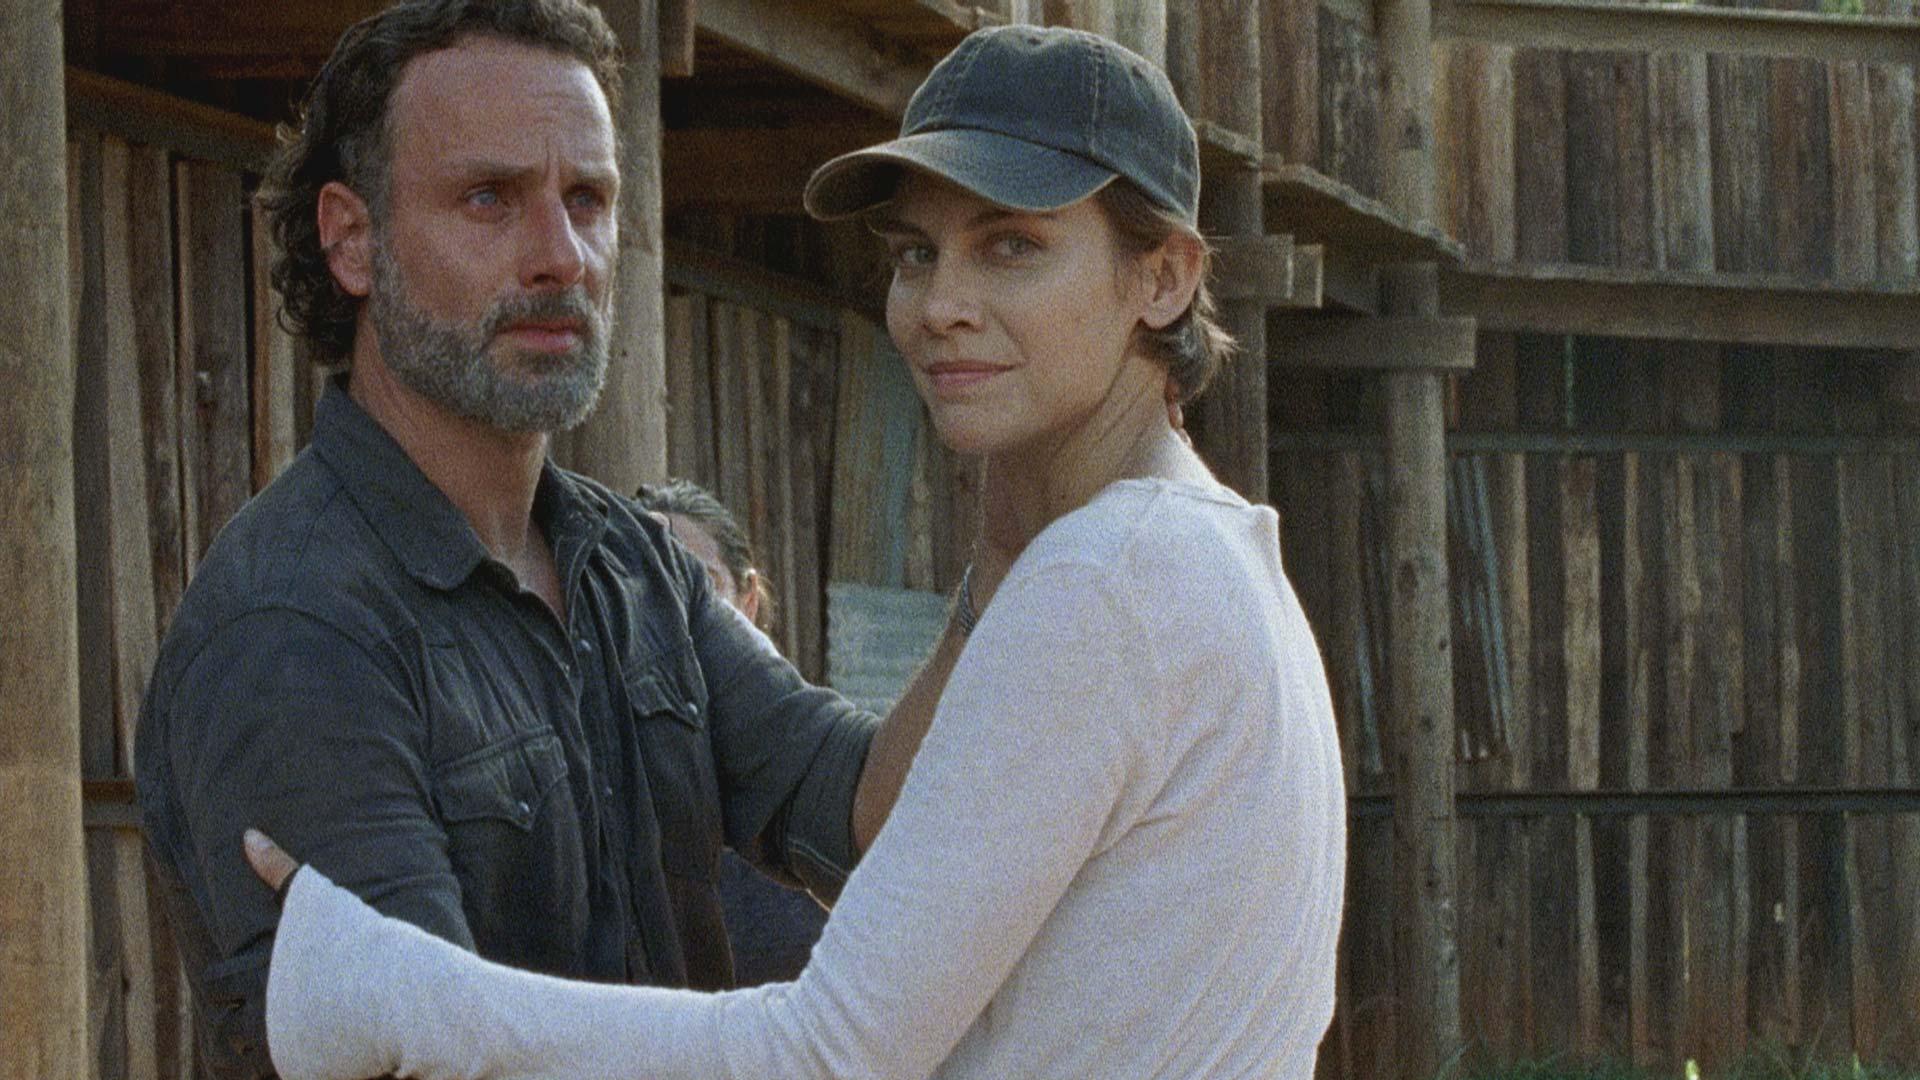 Being human season 3 episode 8 2011 -  Spoilers Talked About Scene From The Walking Dead Season 7 Episode 8